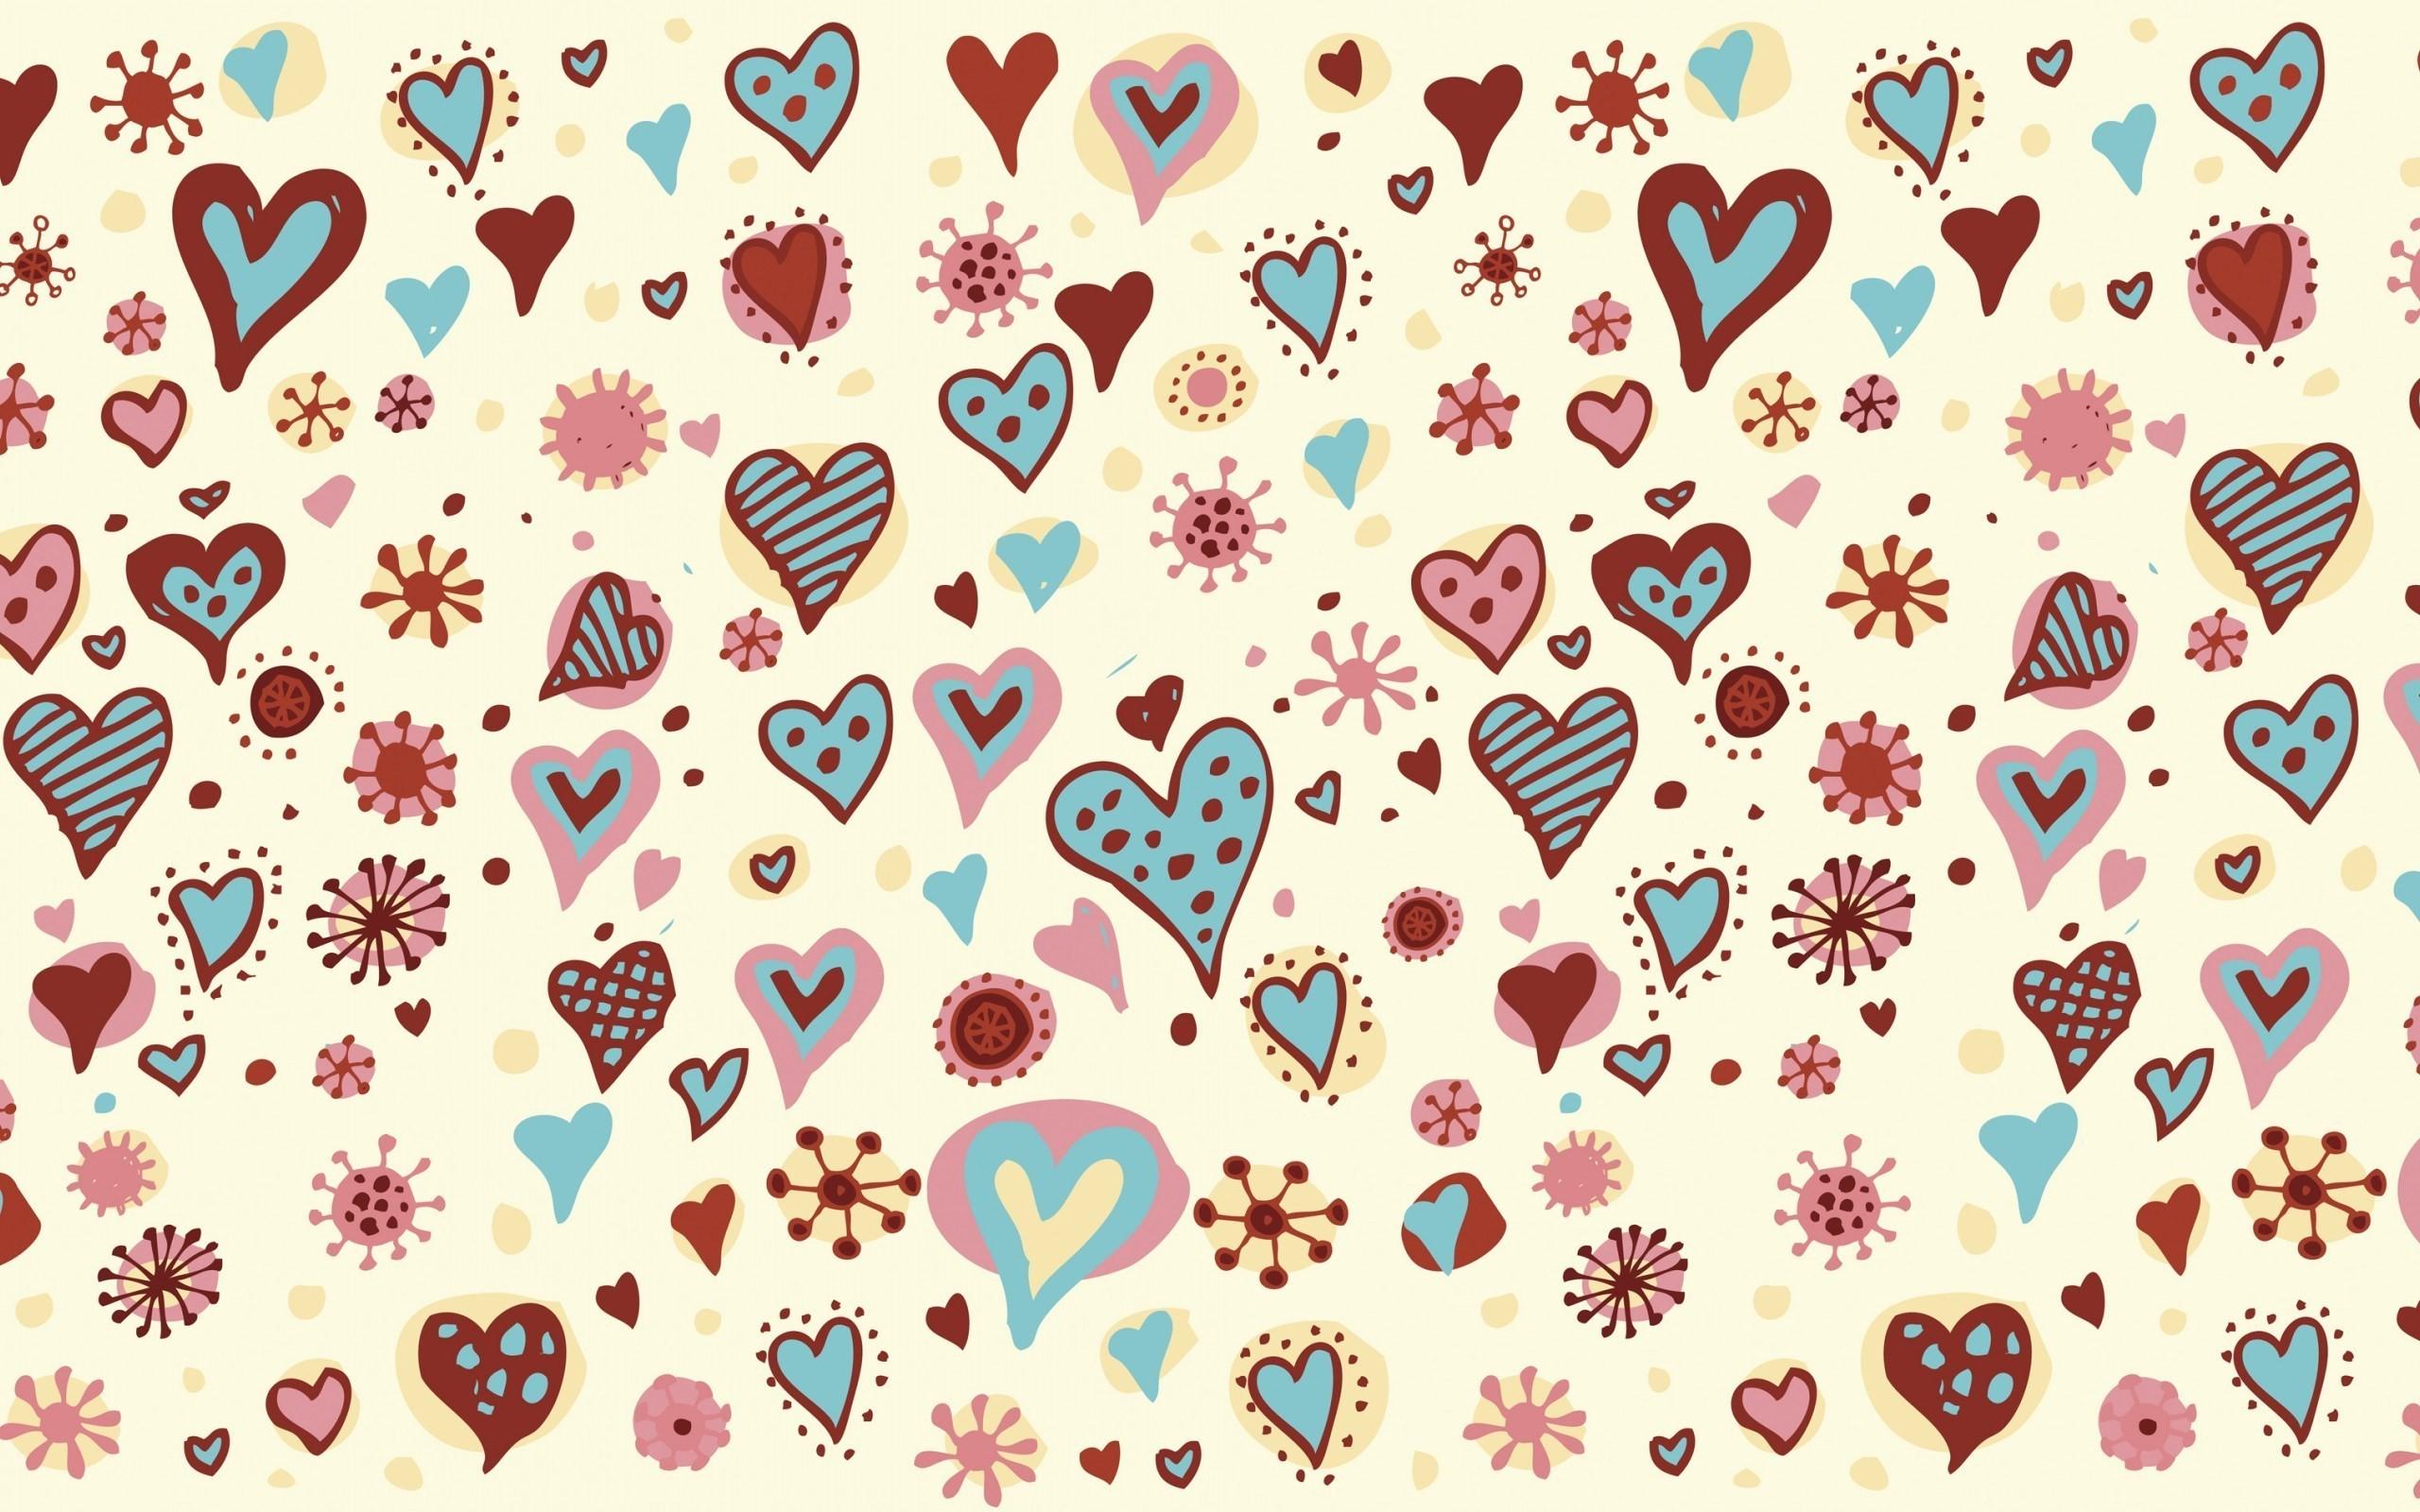 Hearts Texture Love